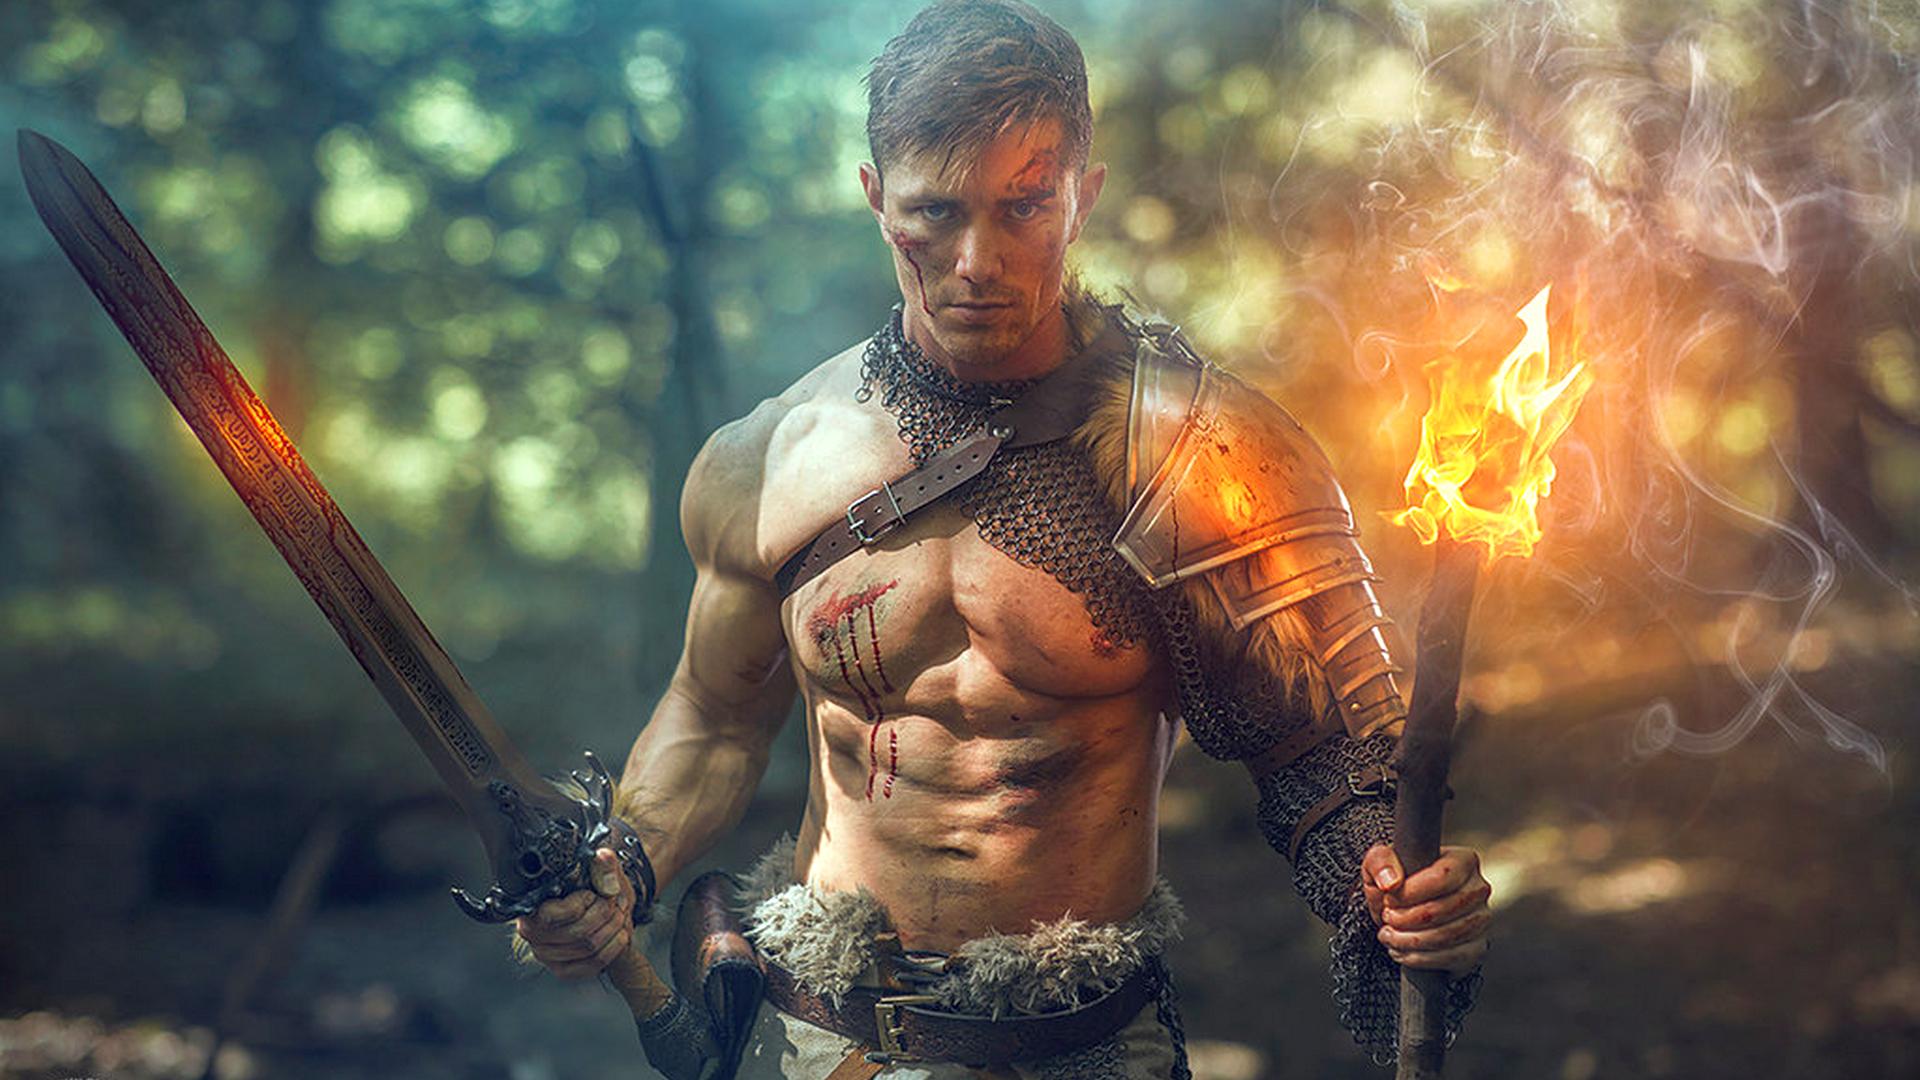 Wallpaper Muscles Muscular Biceps 6 Pack Abs Model Warrior